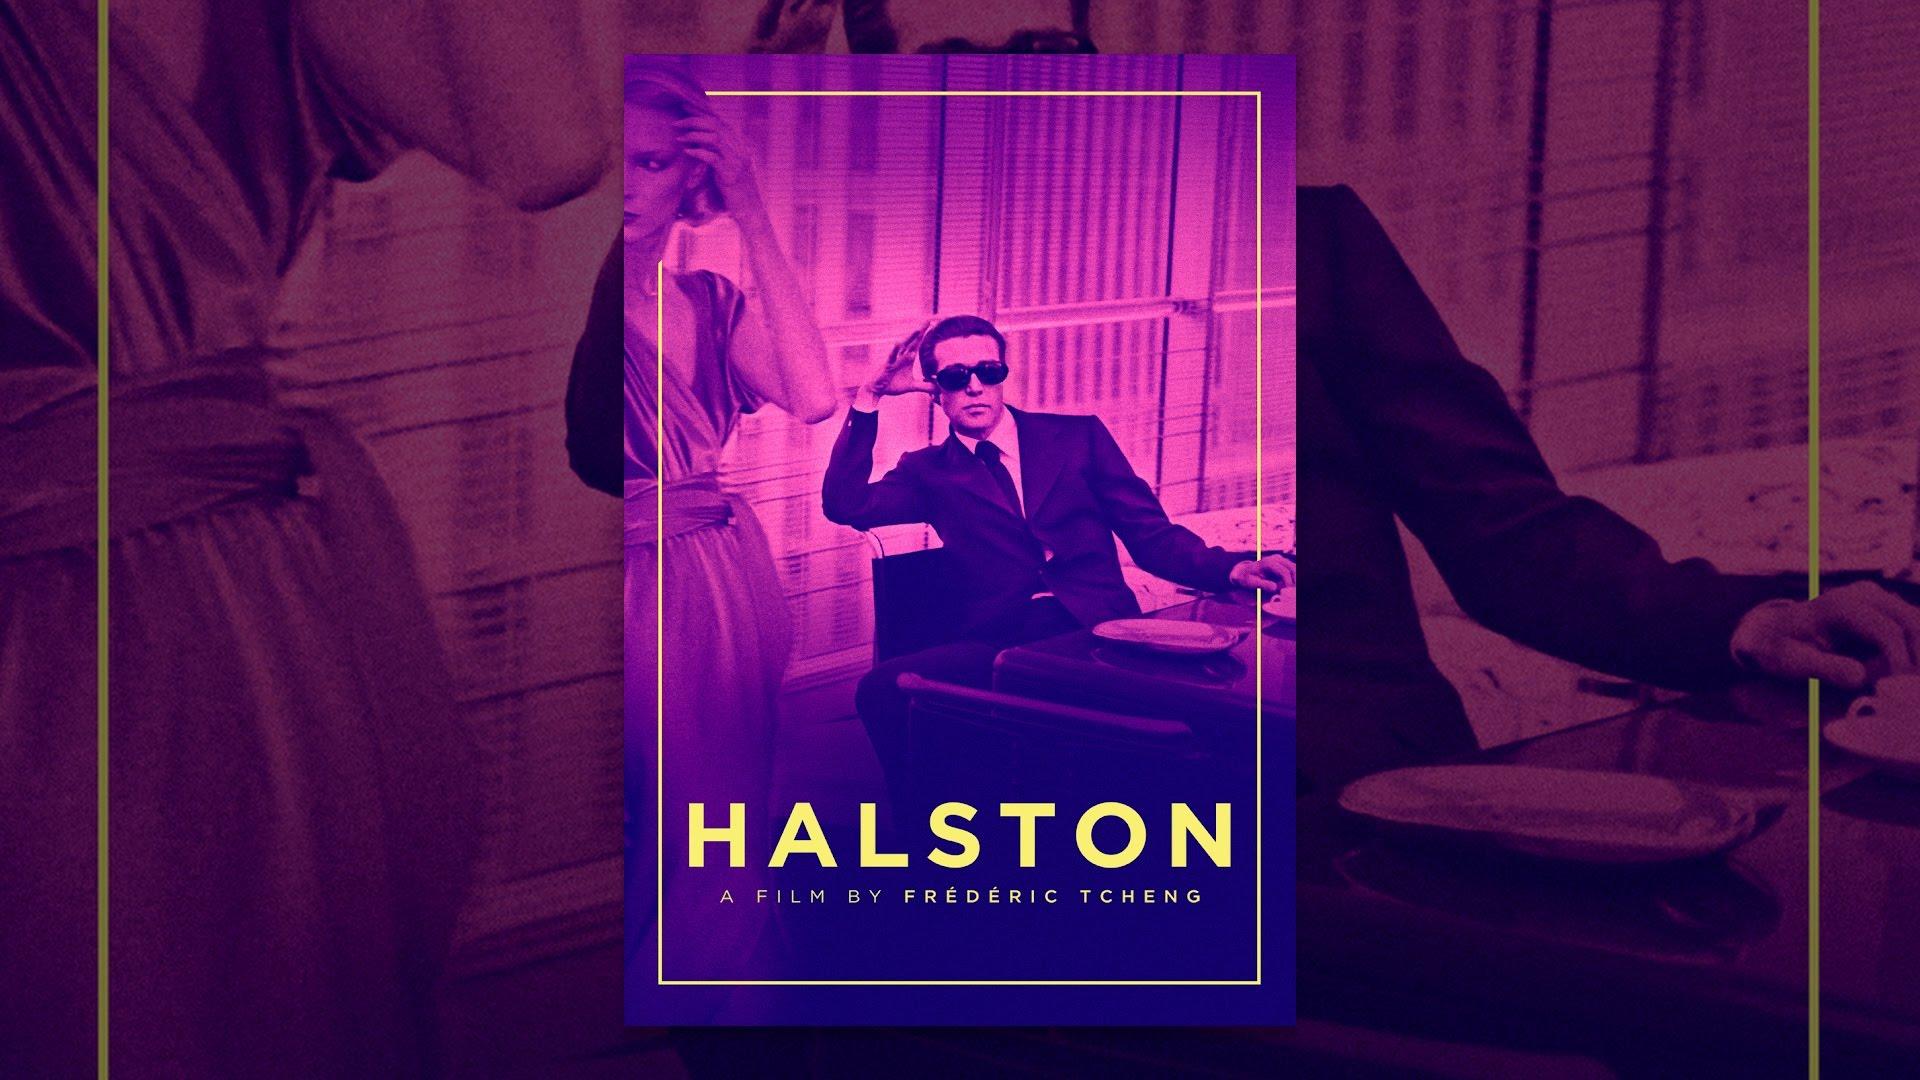 [VIDEO] - Halston 1